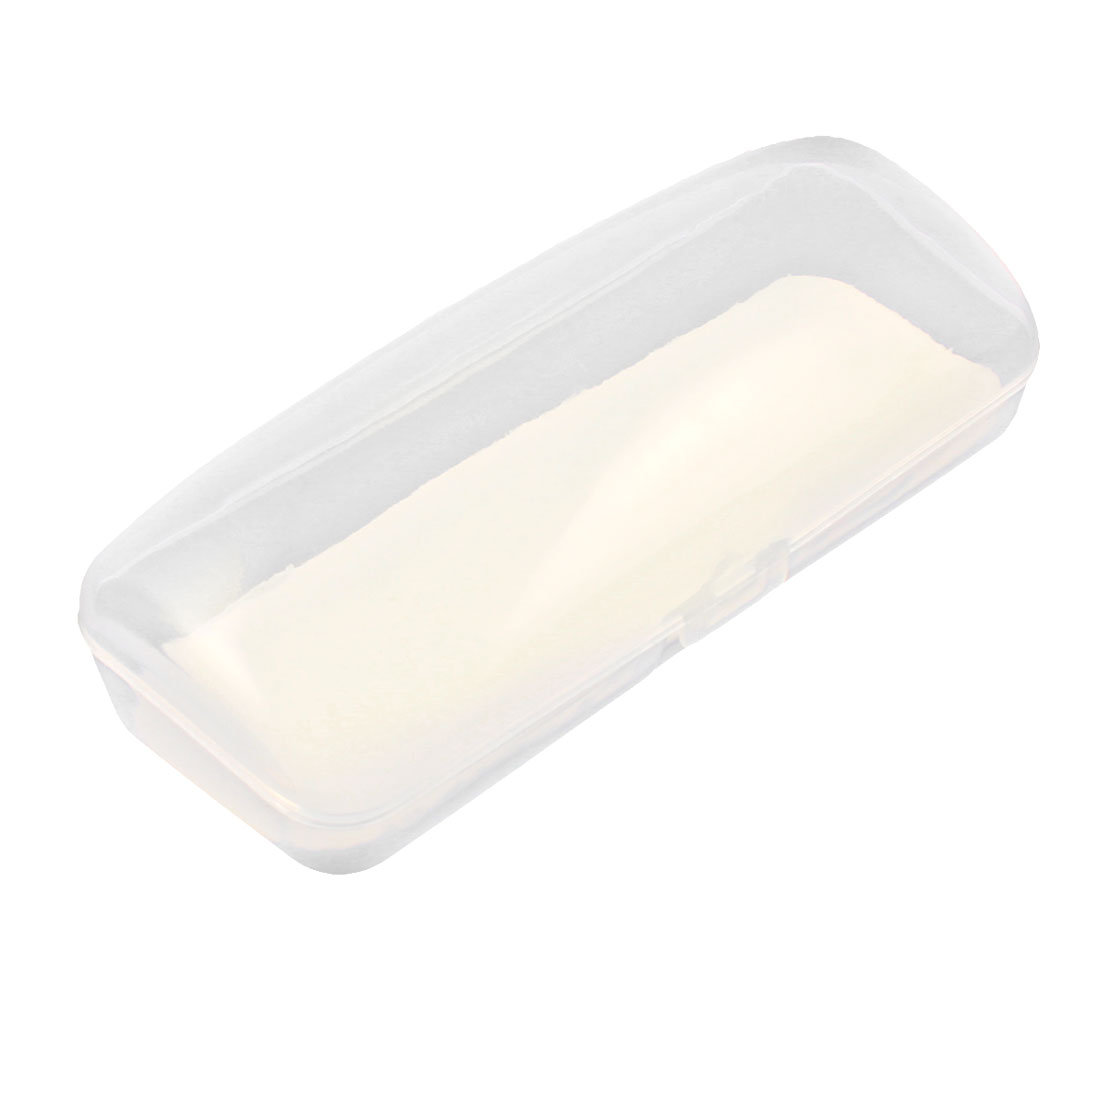 Clear White Plastic Rectangle Shaped Eyeglasses Case Box Holder